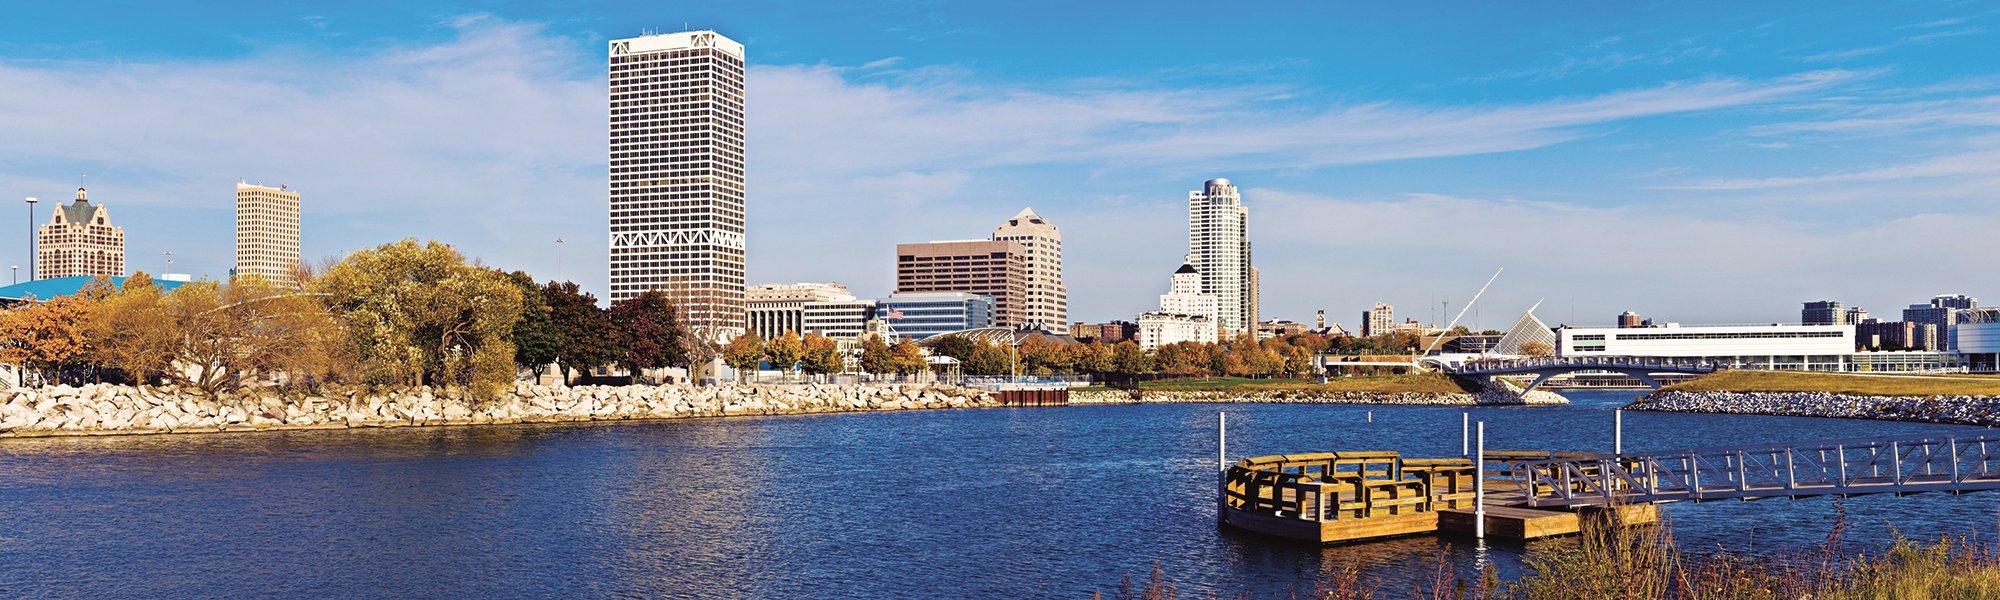 Milwaukee, Wisconsin.jpg